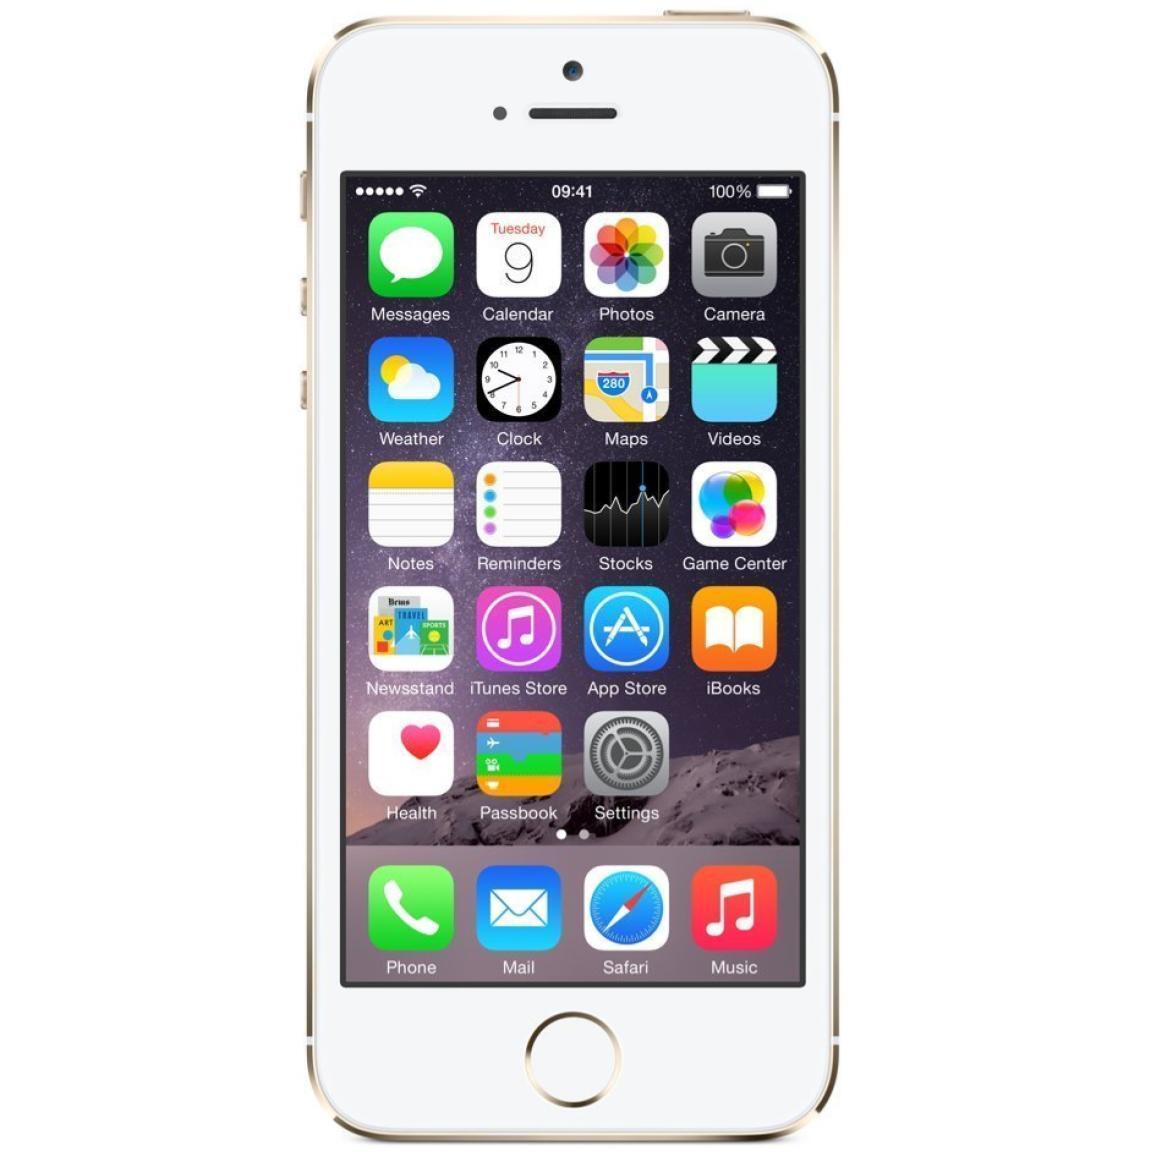 4 von 6 : Apple iPhone 5S - Unlocked - 16GB 32GB 64GB - Gold Gray Silver - Smartphone • 70,66 €